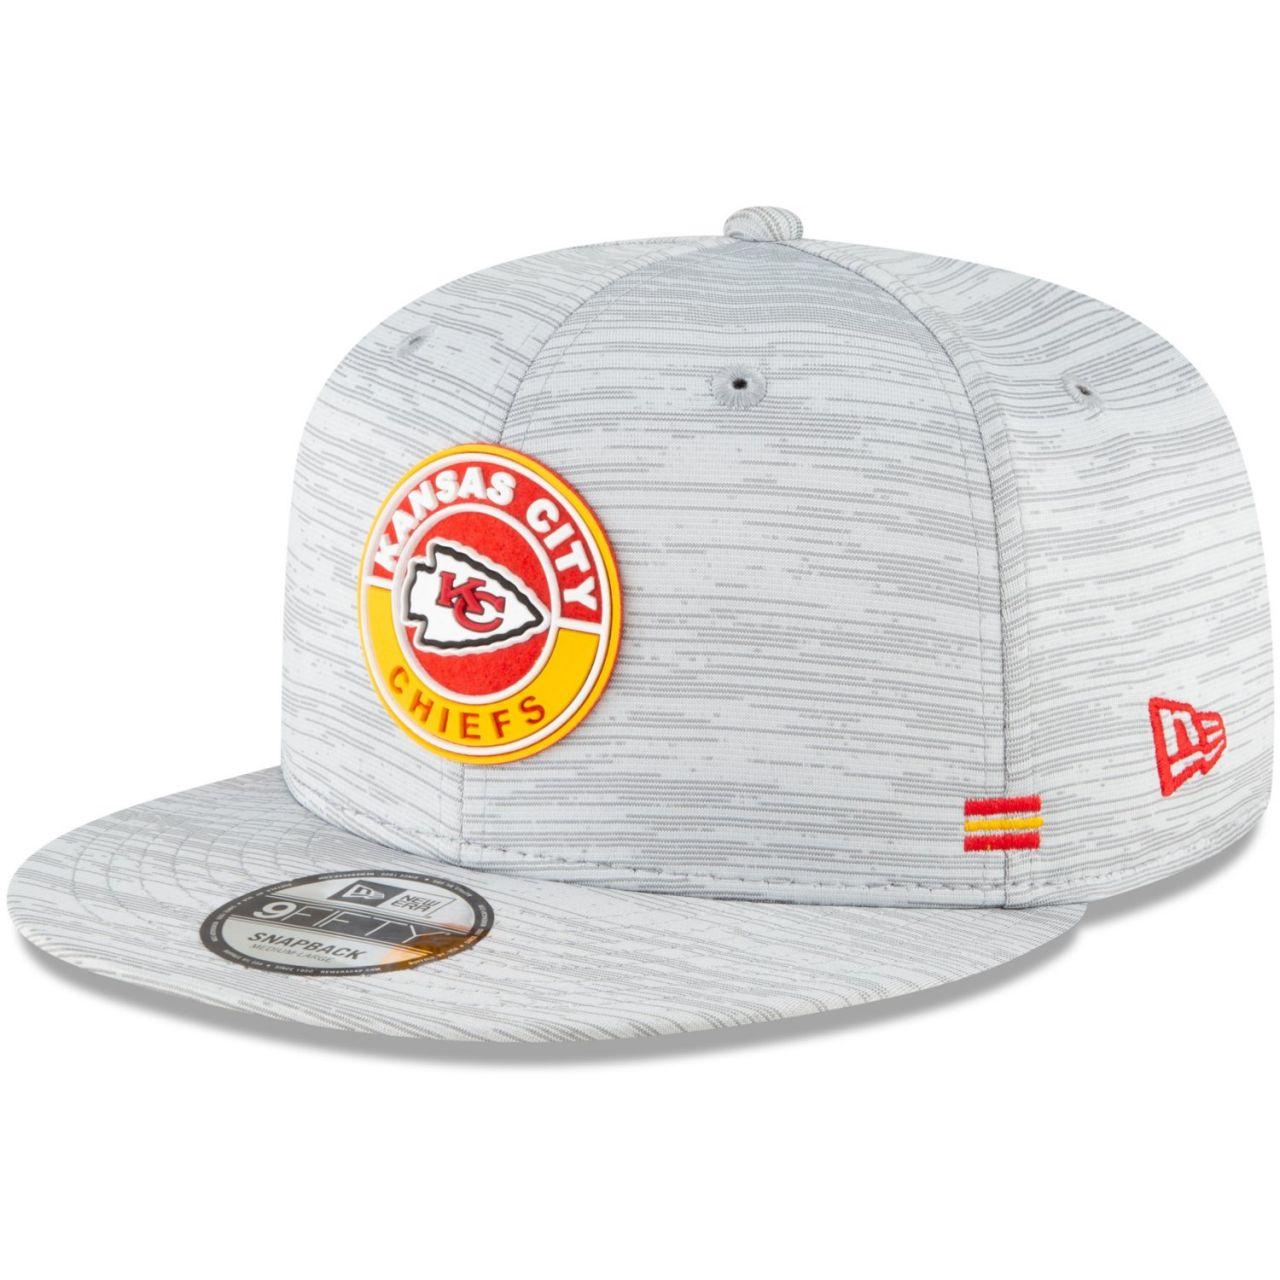 amfoo - New Era 9FIFTY Snapback Cap SIDELINE 2020 Kansas City Chiefs